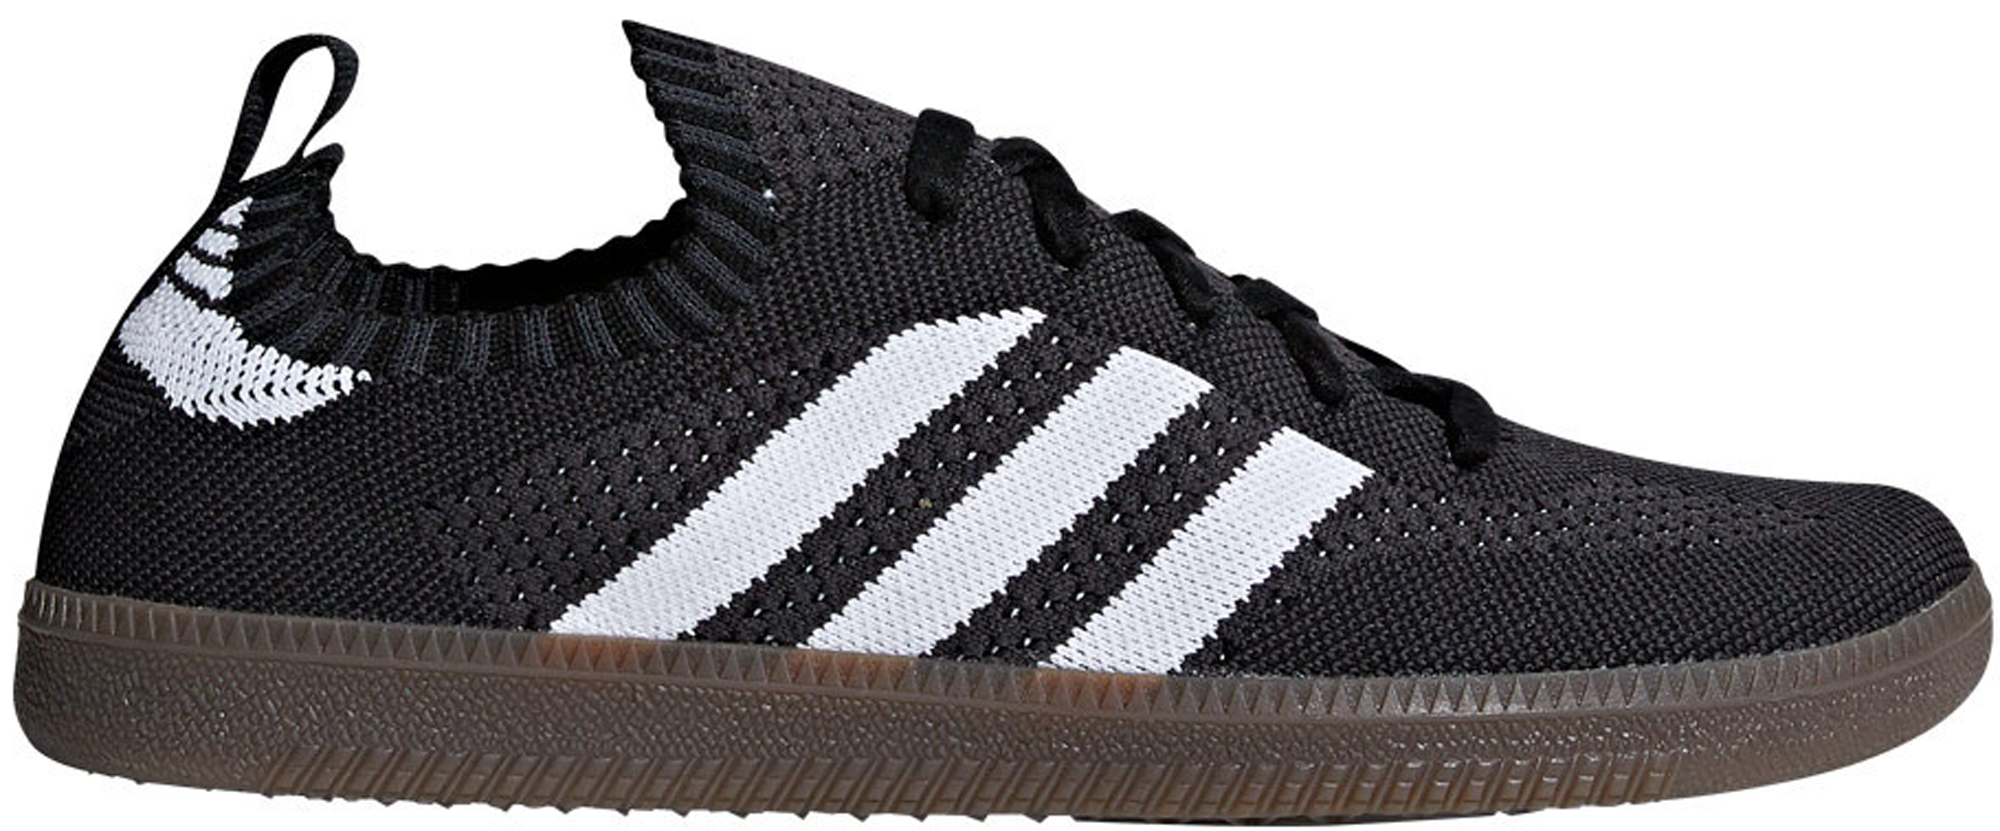 adidas Samba Sock Black White